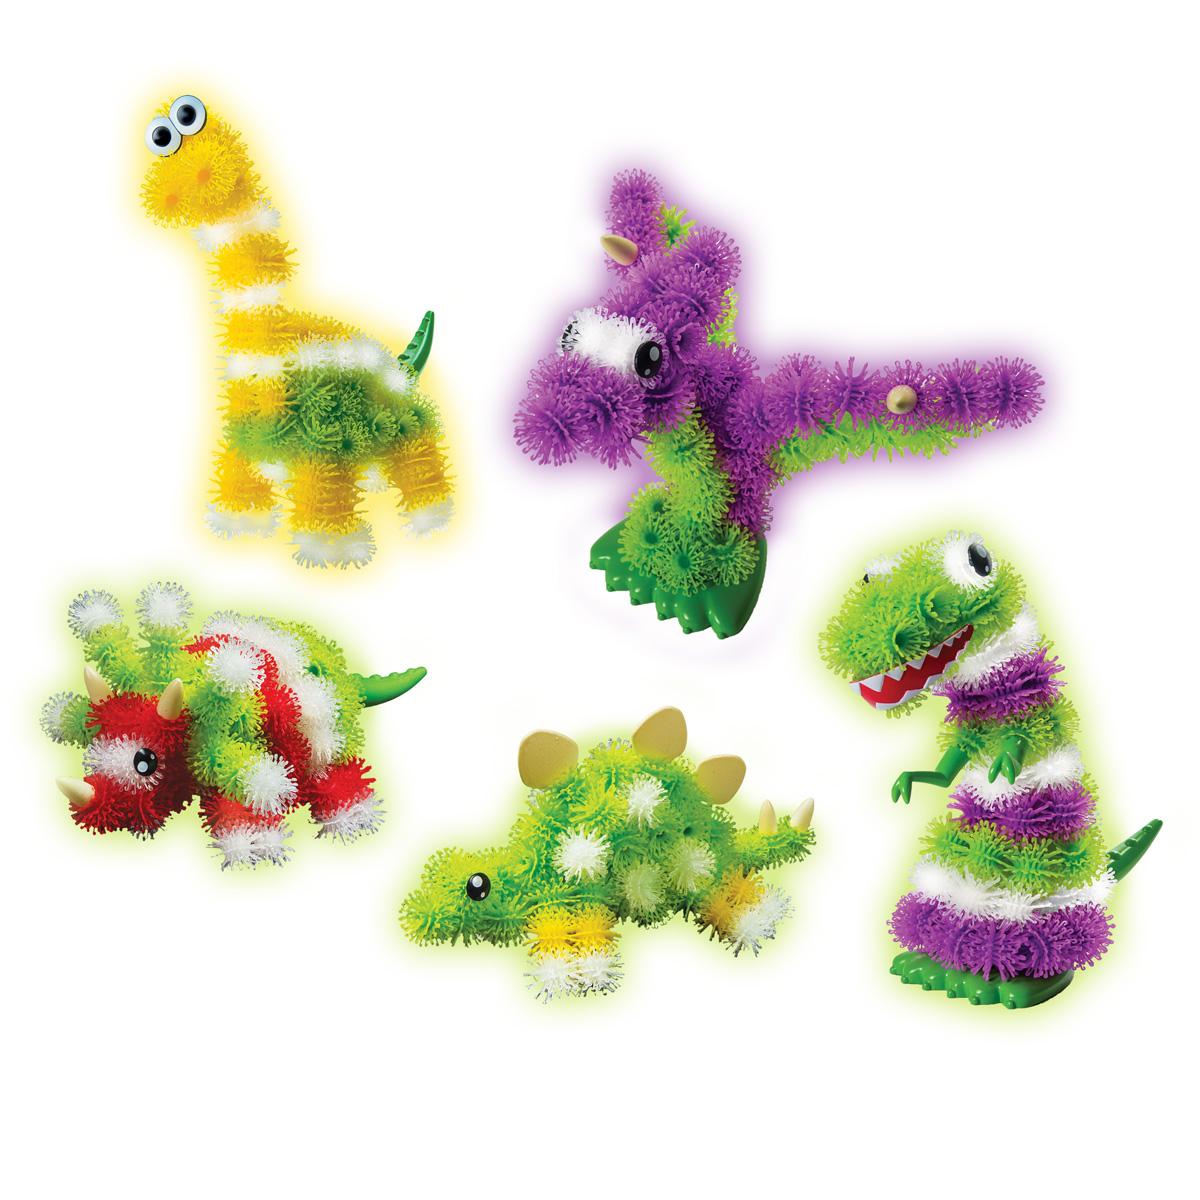 Тематический набор Bunchems  Динозавры - Конструктор-липучка Банчемс, артикул: 146357